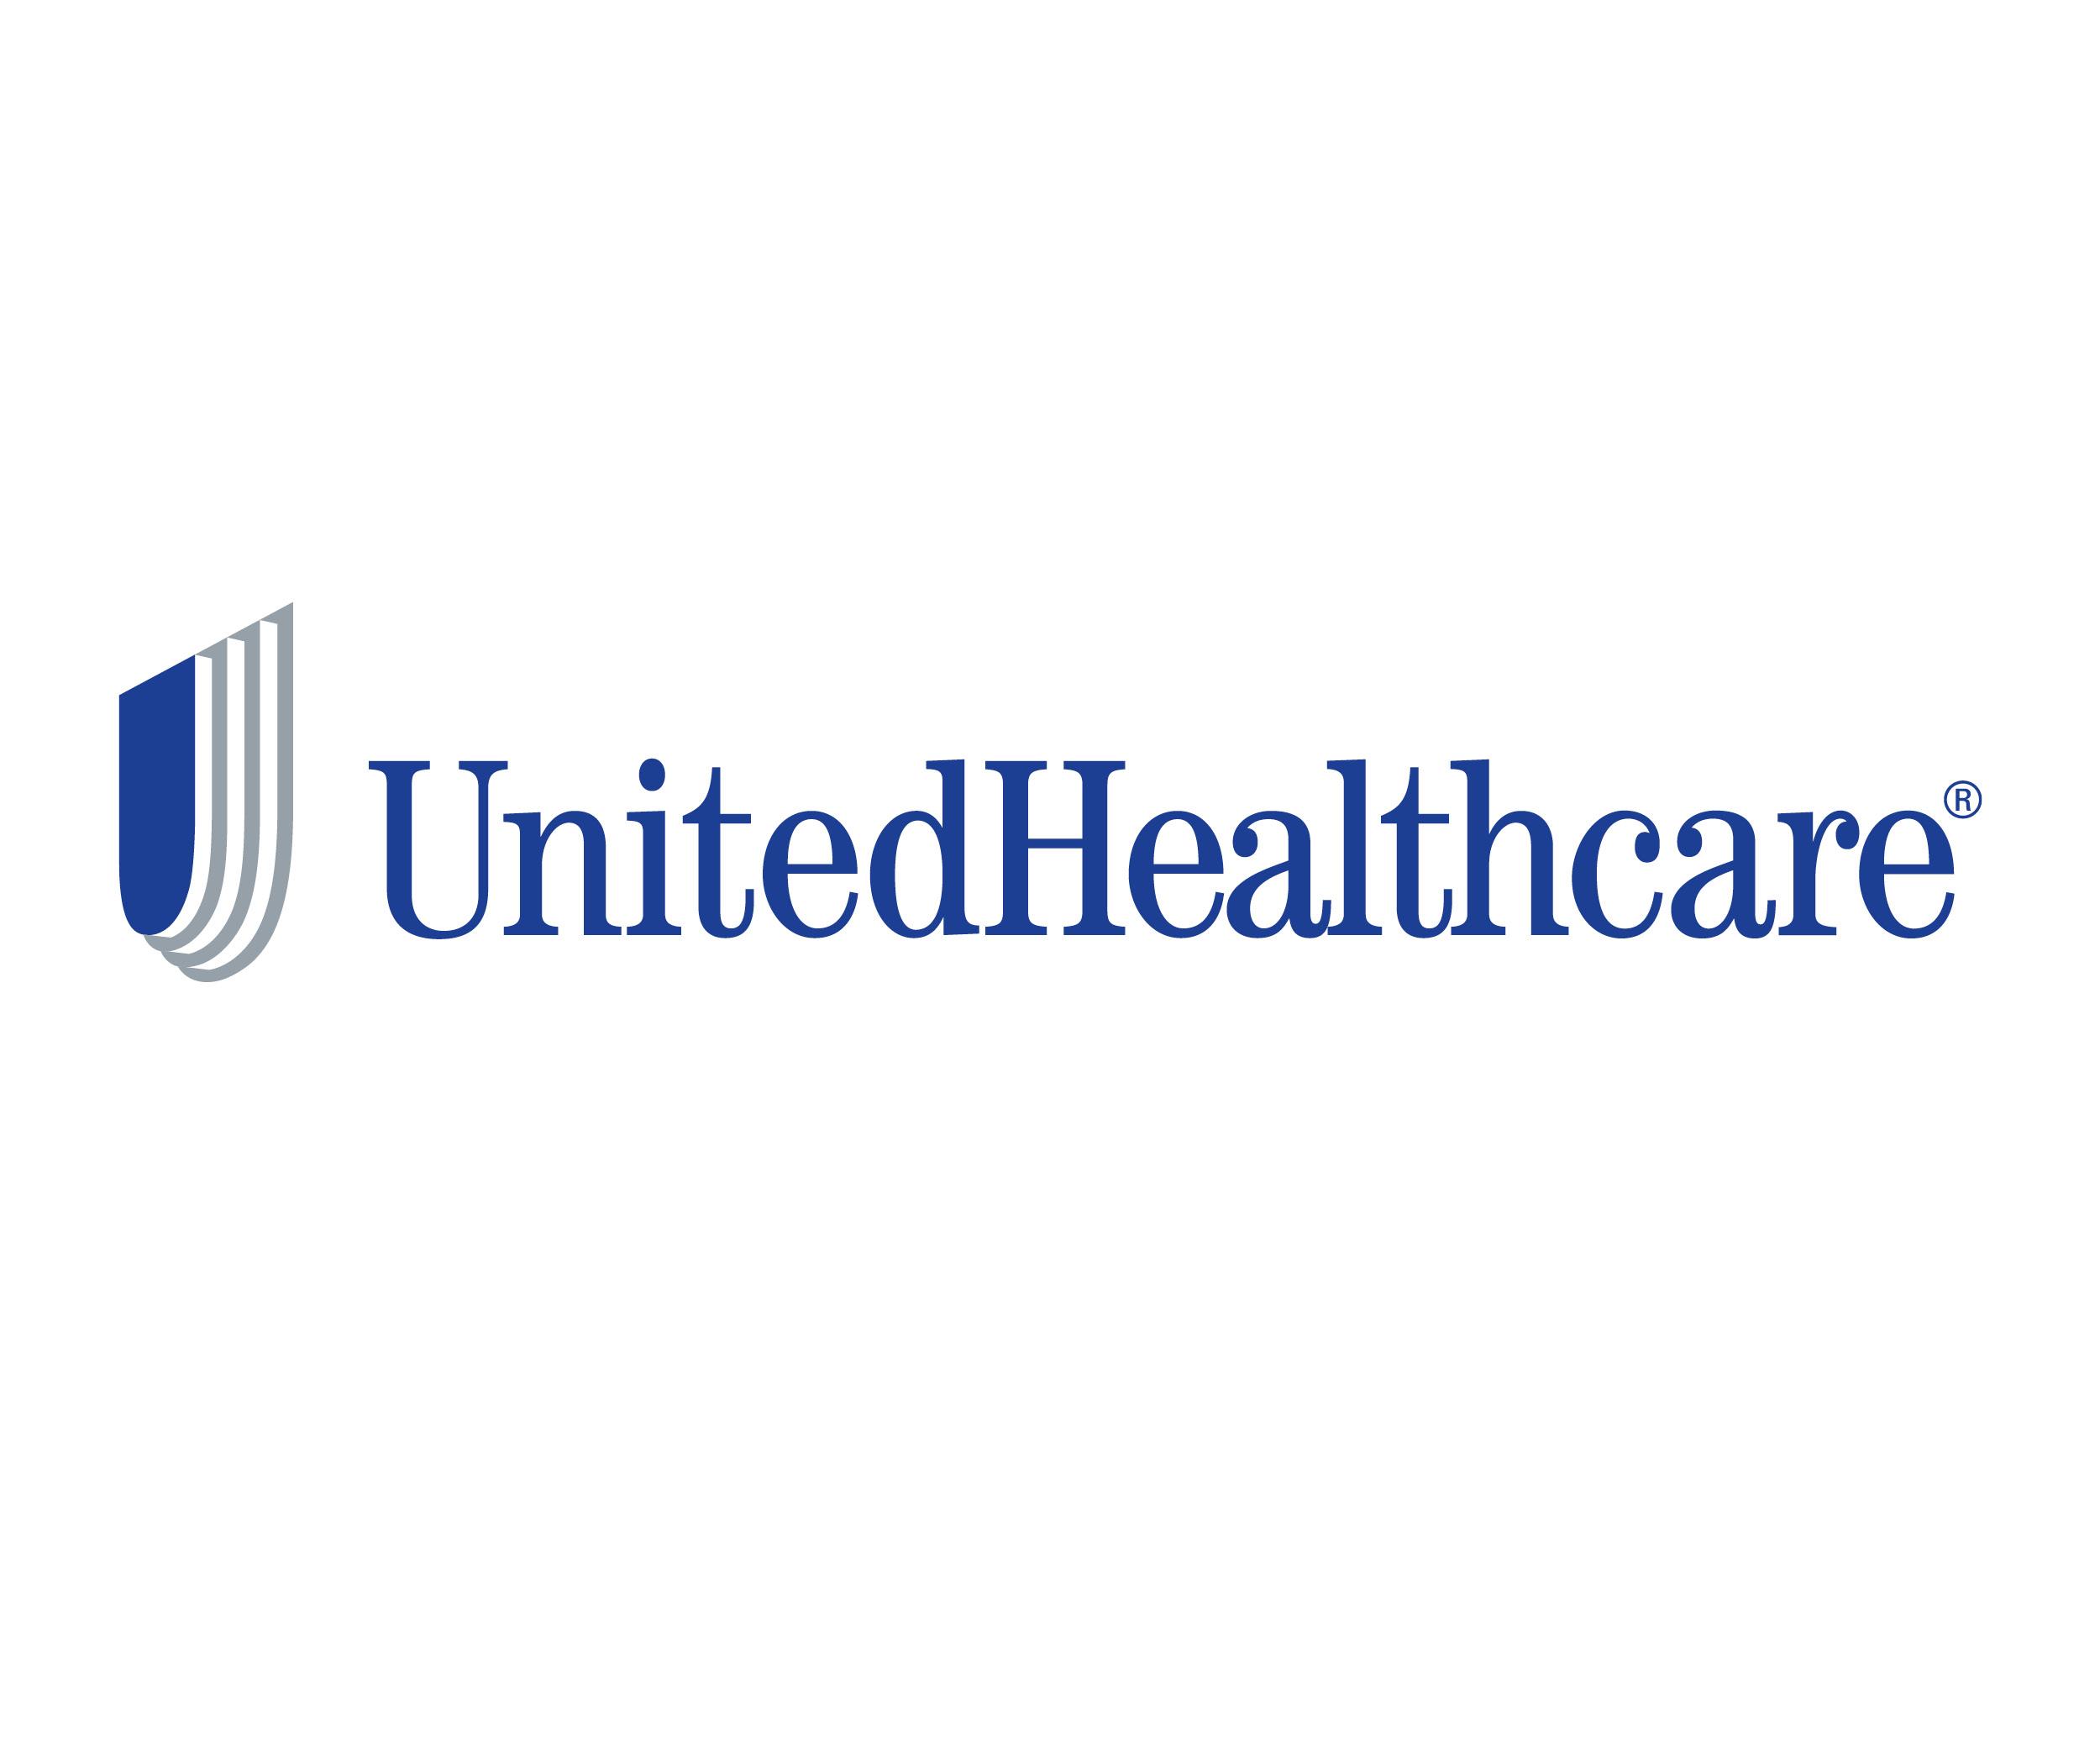 Astonishing-United-Health-Care-Logo-55-About-Remodel-Cool-Logos-with-United-Health-Care-Logo.jpeg